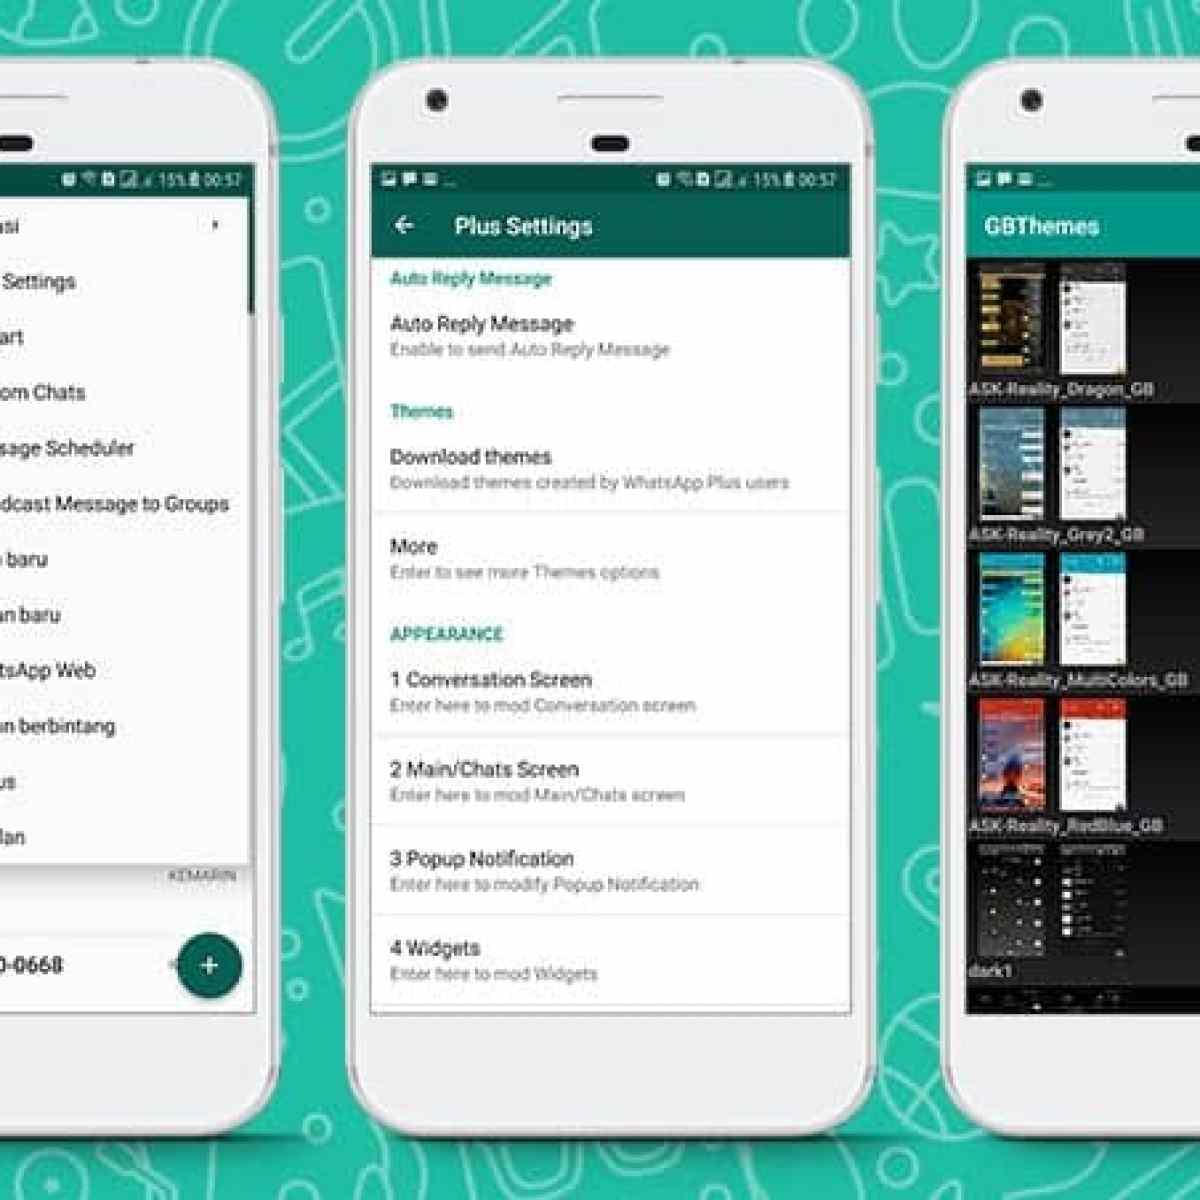 19 Whatsapp Mod Apk Anti Ban Download Versi Terbaru 2020